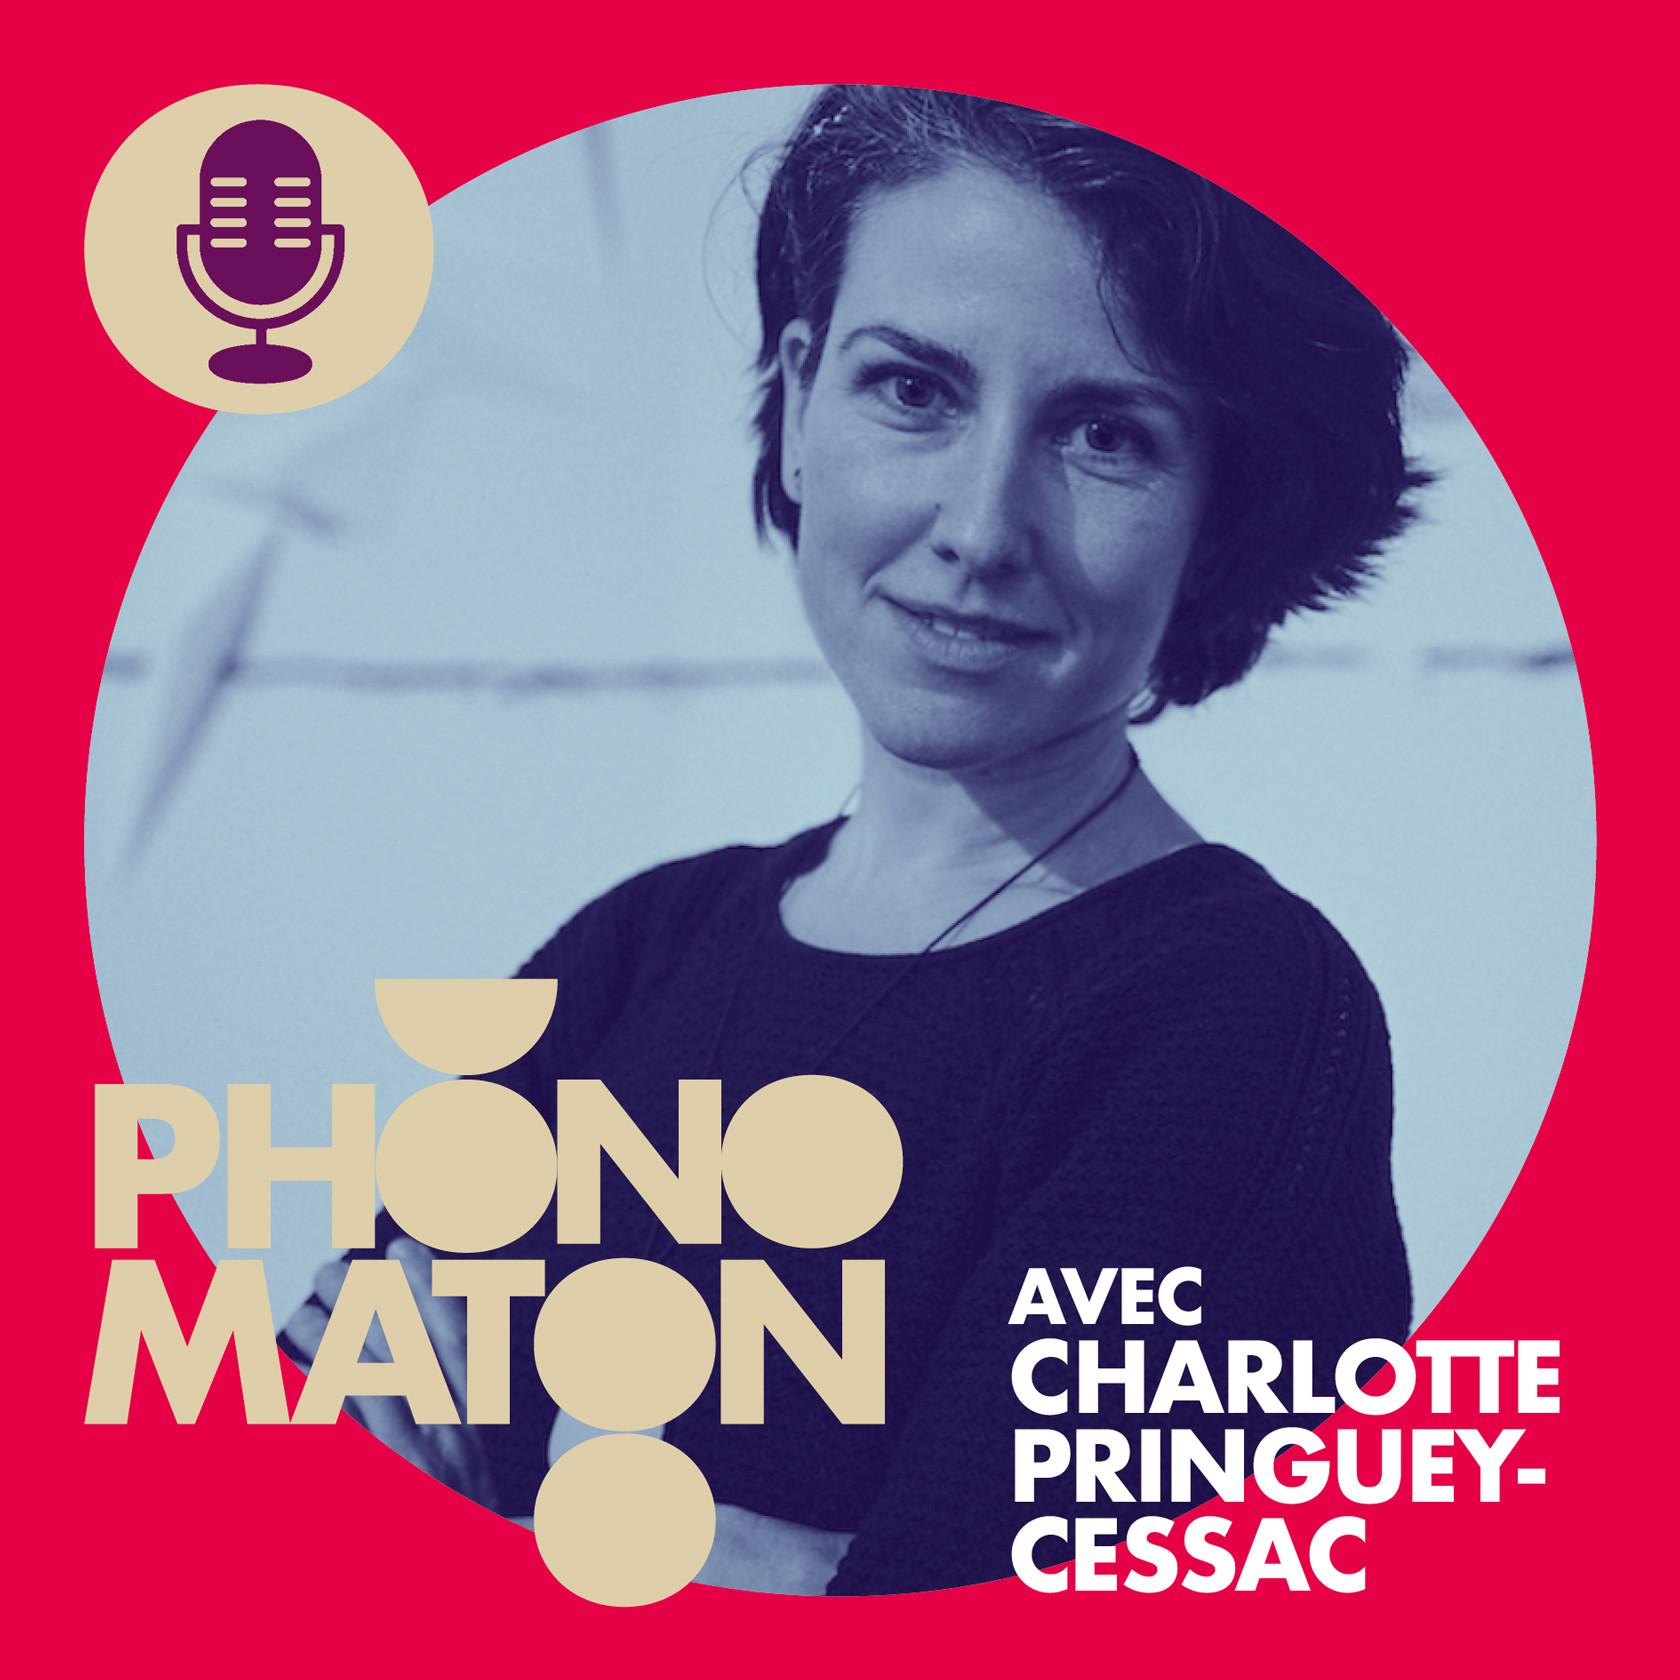 Phonomaton avec Charlotte Pringuey-Cessac